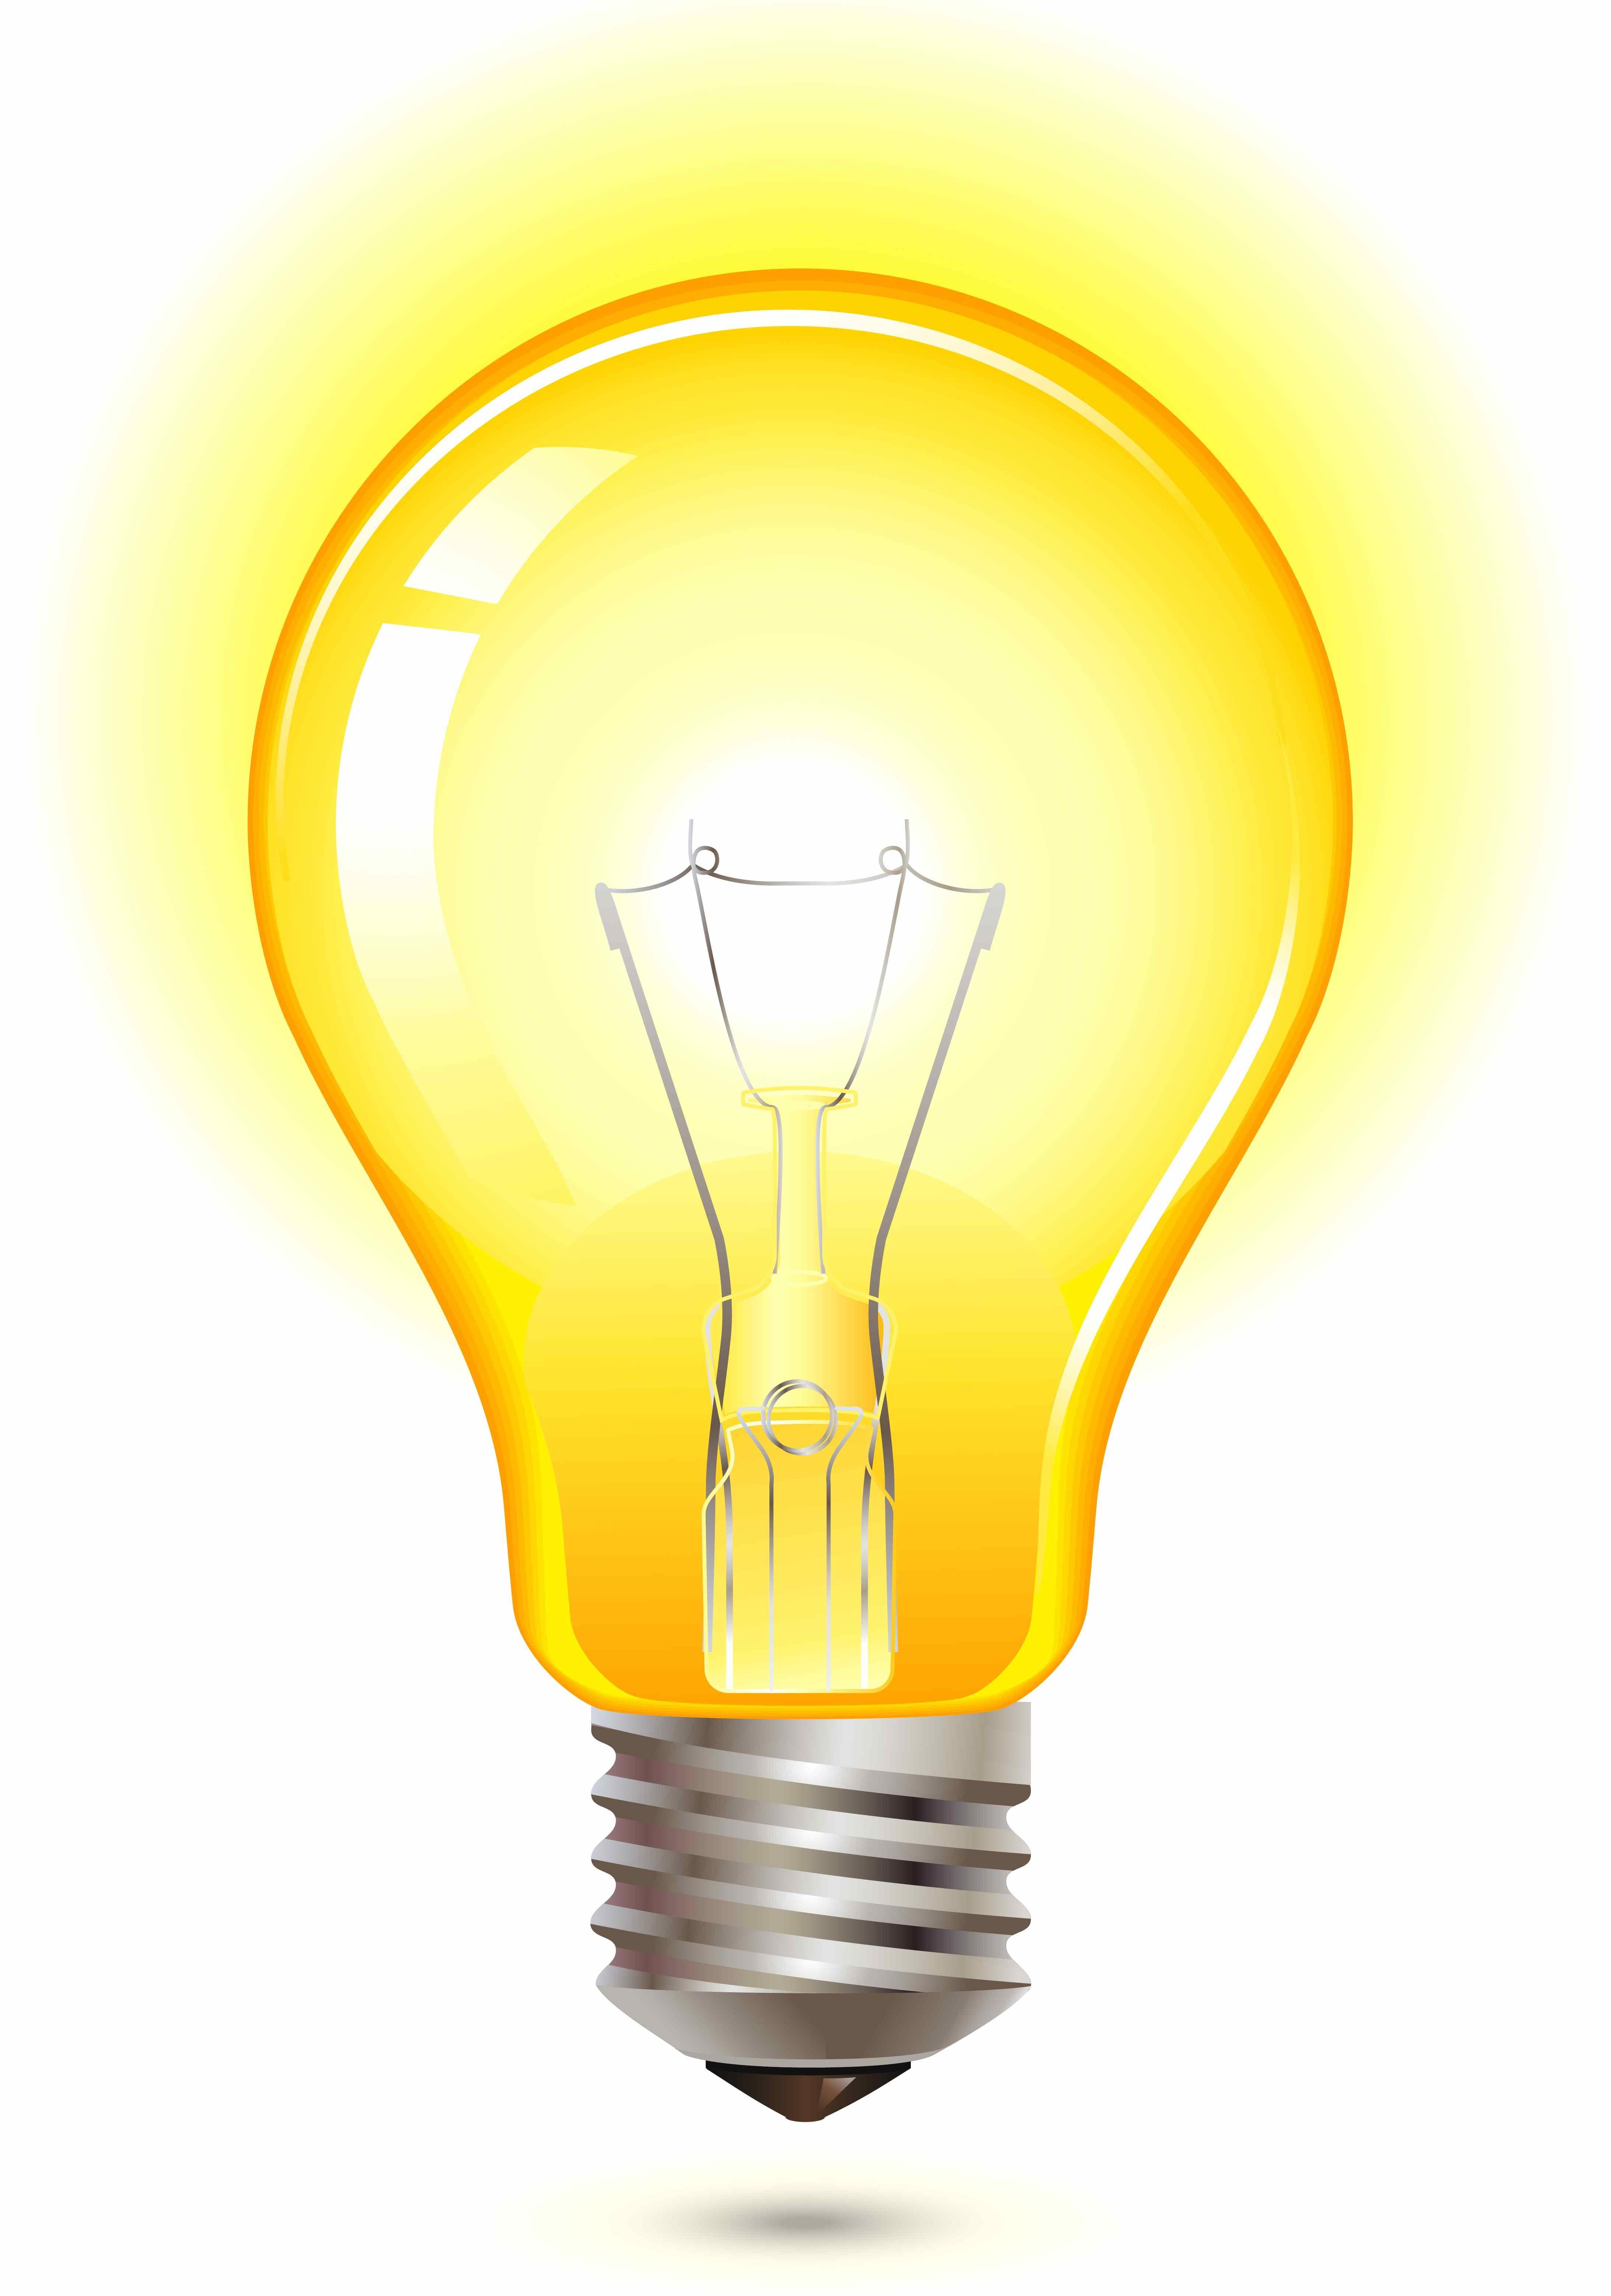 Lightbulb light bulbs cliparts and others art inspiration.